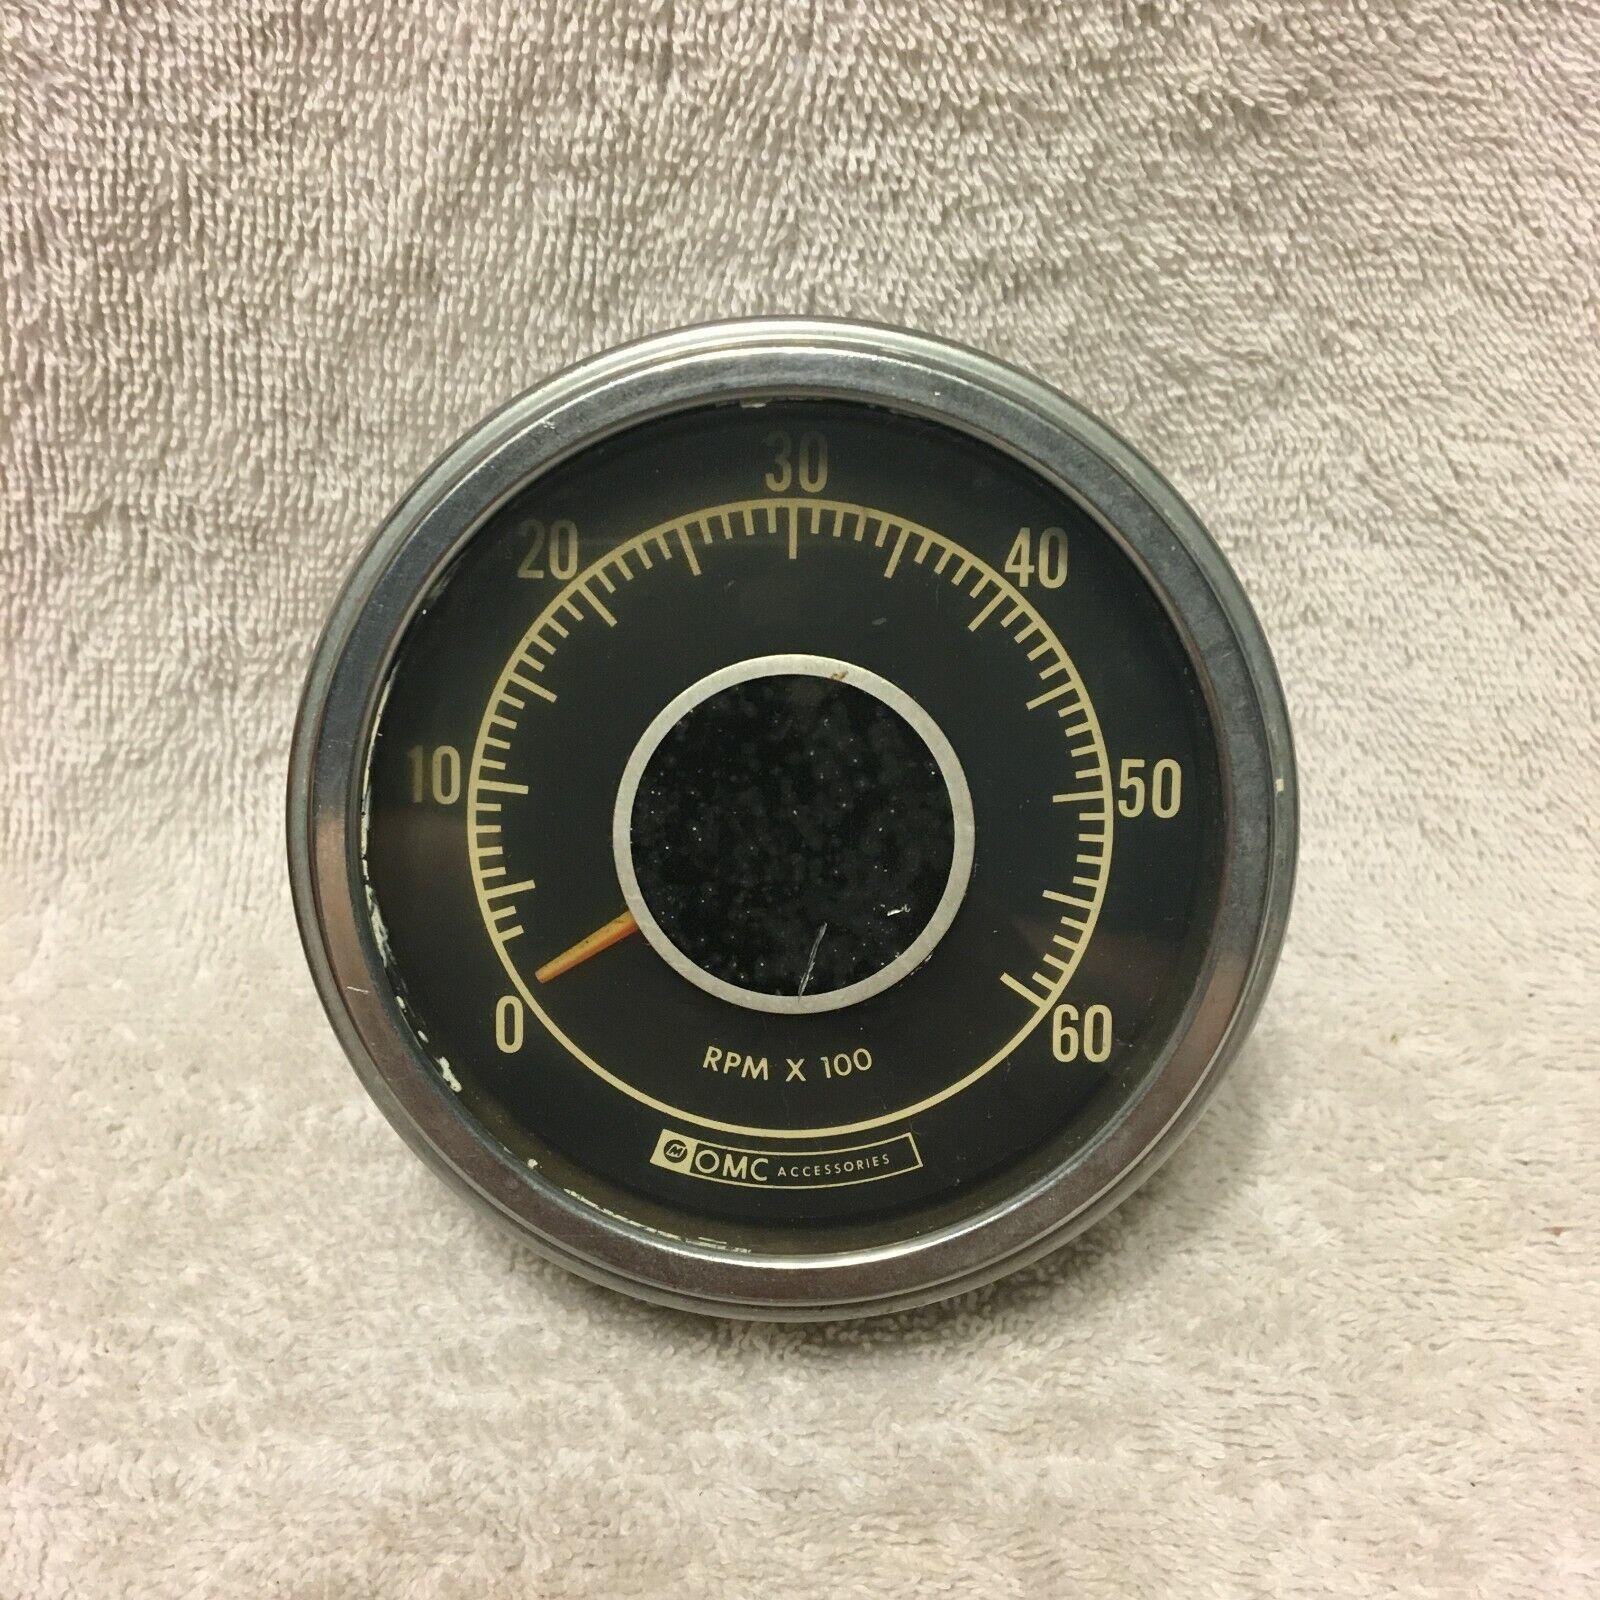 Vintage Marine Alternator Gauge Tachometer OMC RPM x 100 60 Accessories Outboard